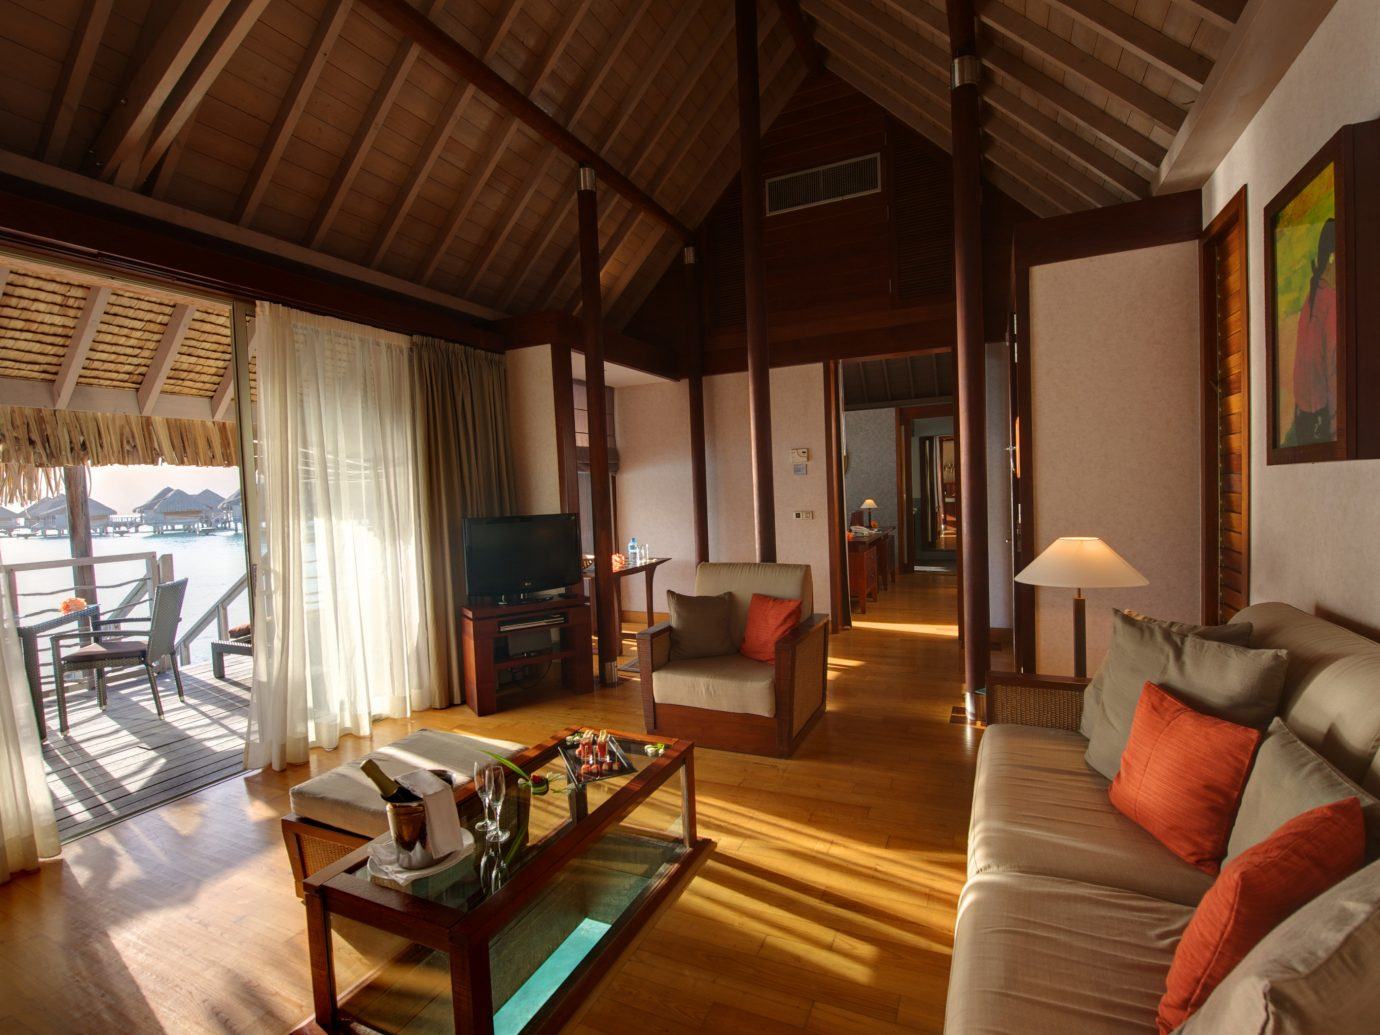 All-Inclusive Resorts Boutique Hotels Hotels Romance indoor room sofa floor Living living room interior design real estate Suite ceiling furniture house hardwood area